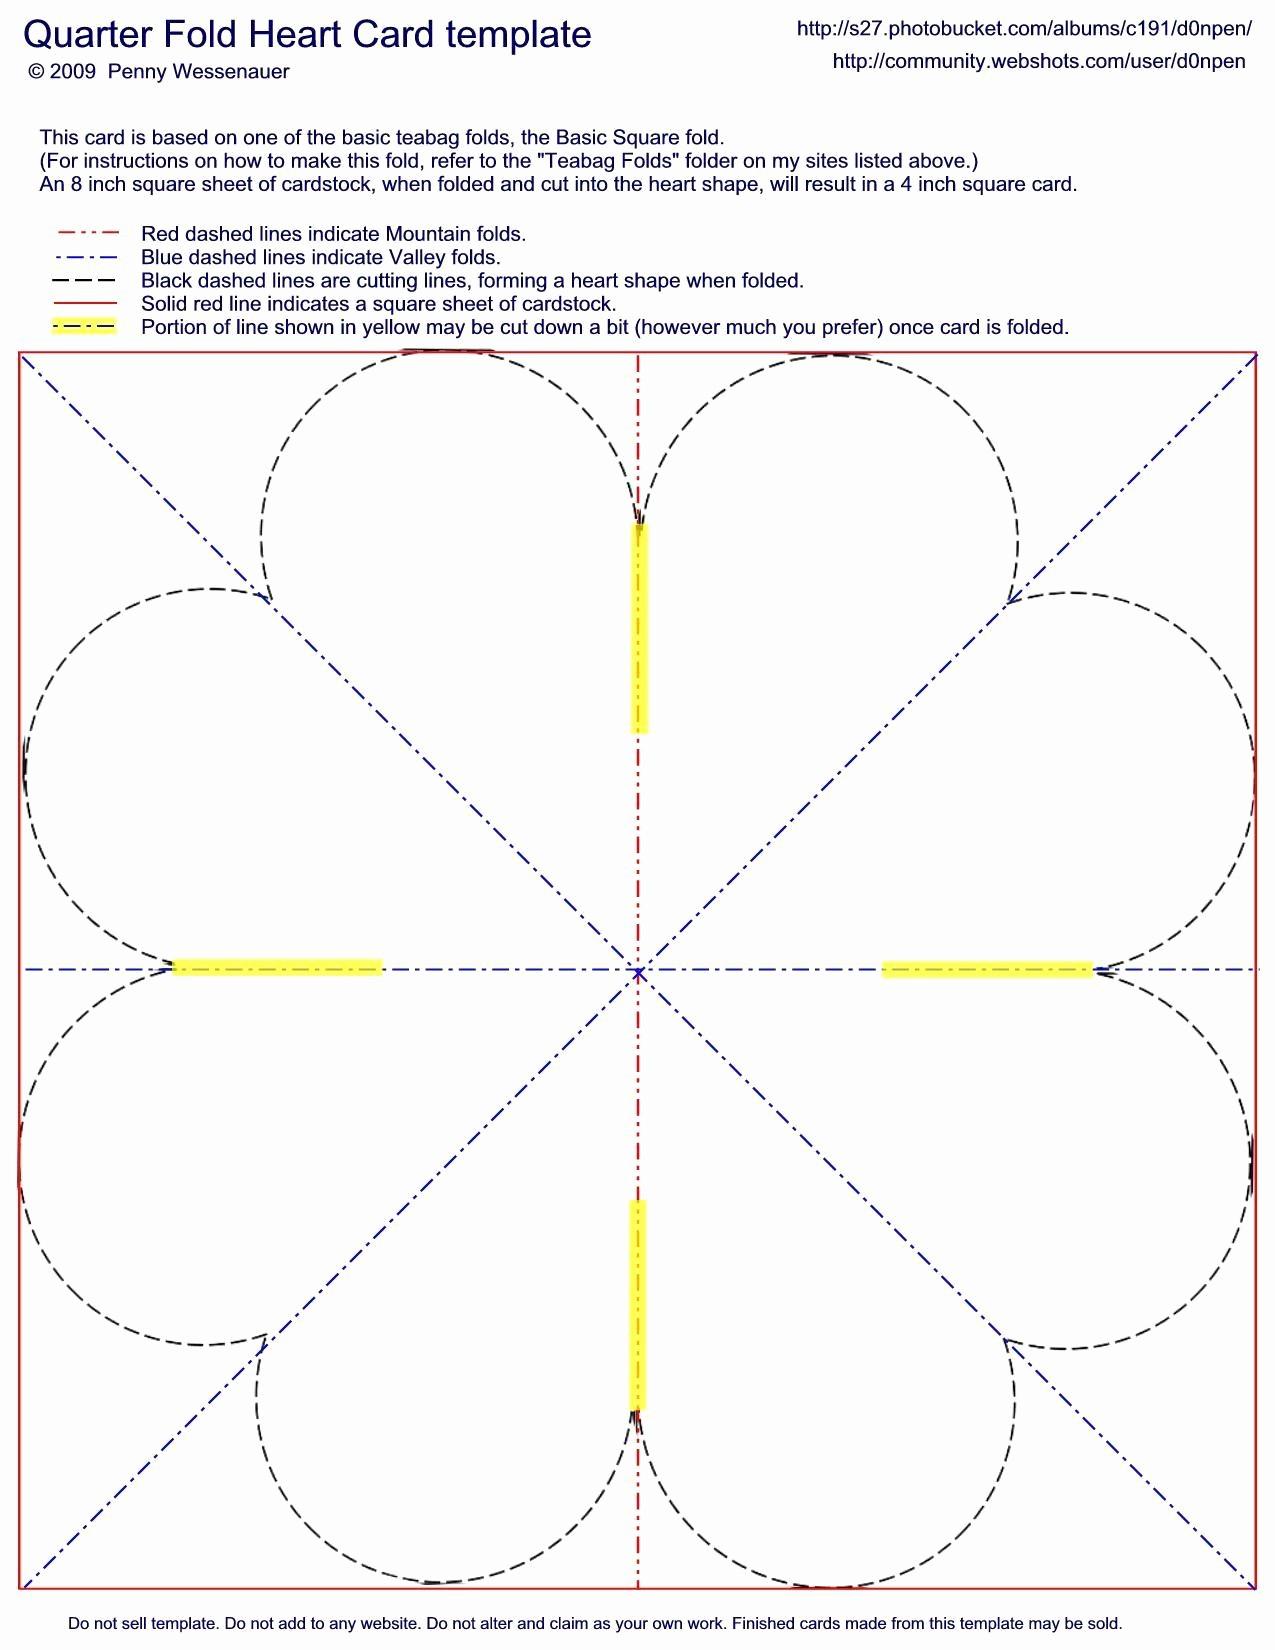 Folded Thank You Card Template Elegant Quarter Fold Heart Card by D0npen